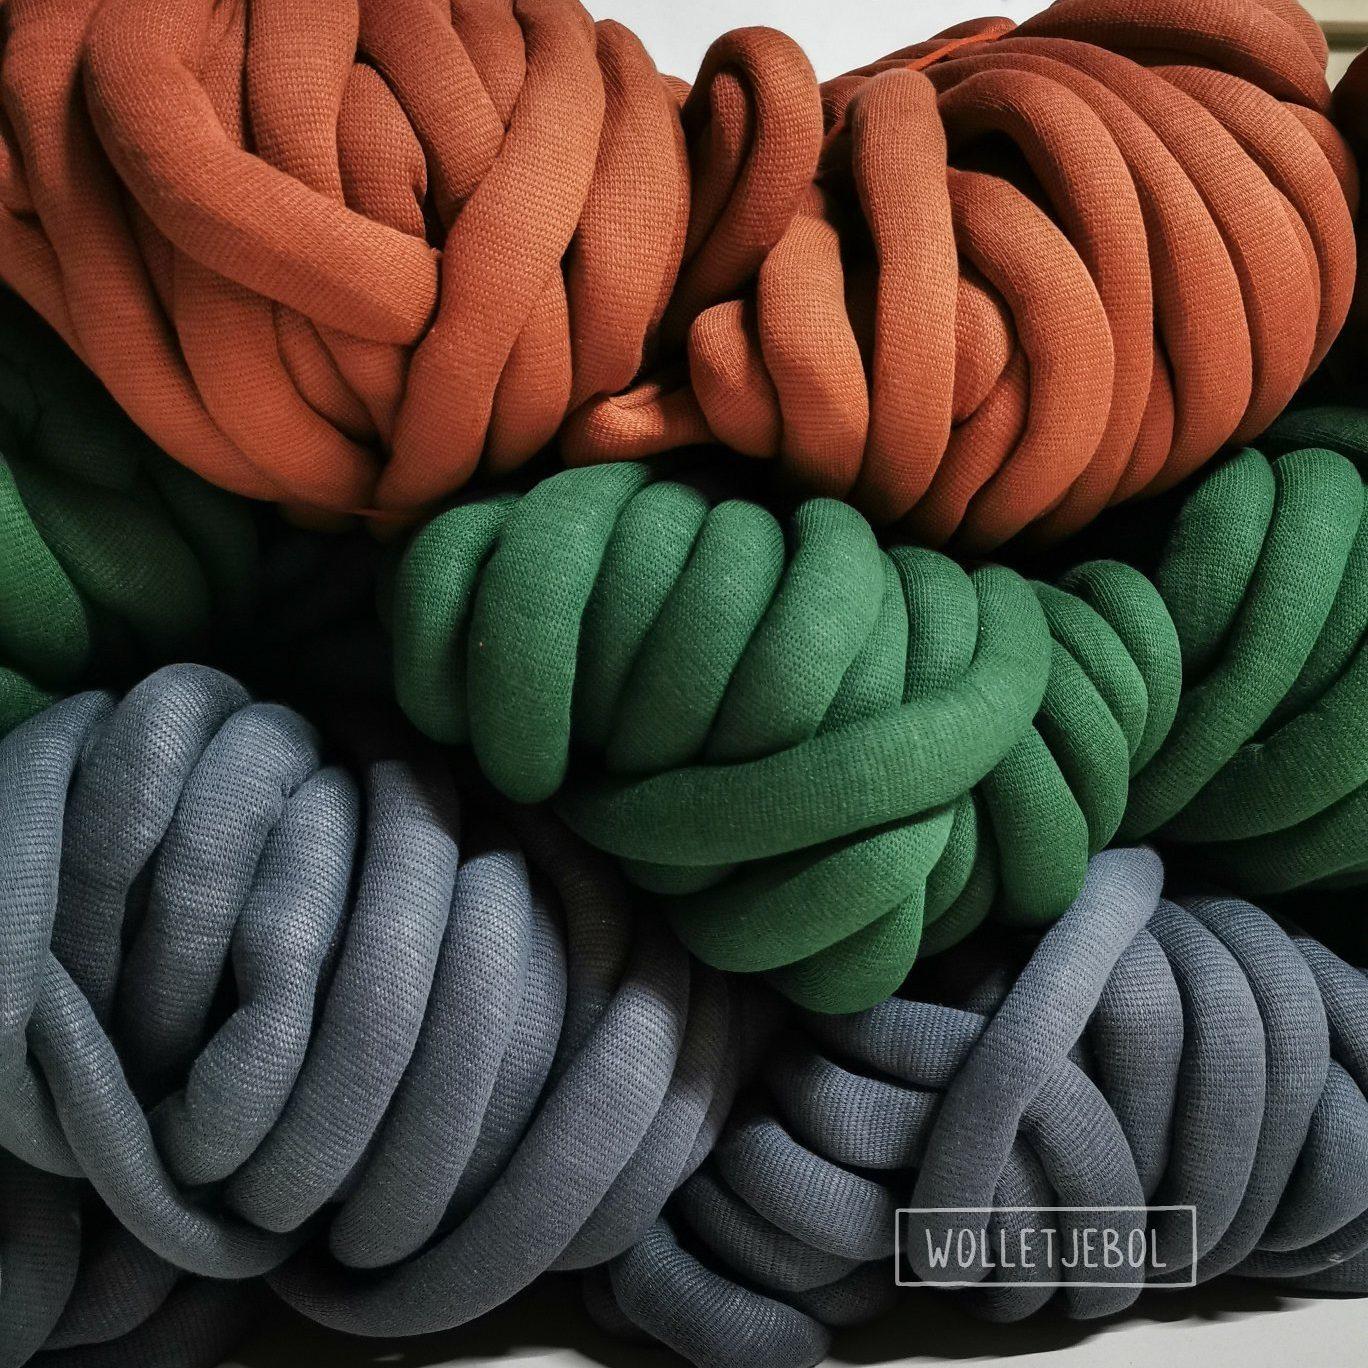 Terra Dark green Anthracite DIY chunky organic cotton soft dusty xxl knit crochet plaid bolletje wol bolletje wolletje big cotton vegan childfriendly animalfriendly wolletjebol gots do it yourself diy buy merino wool